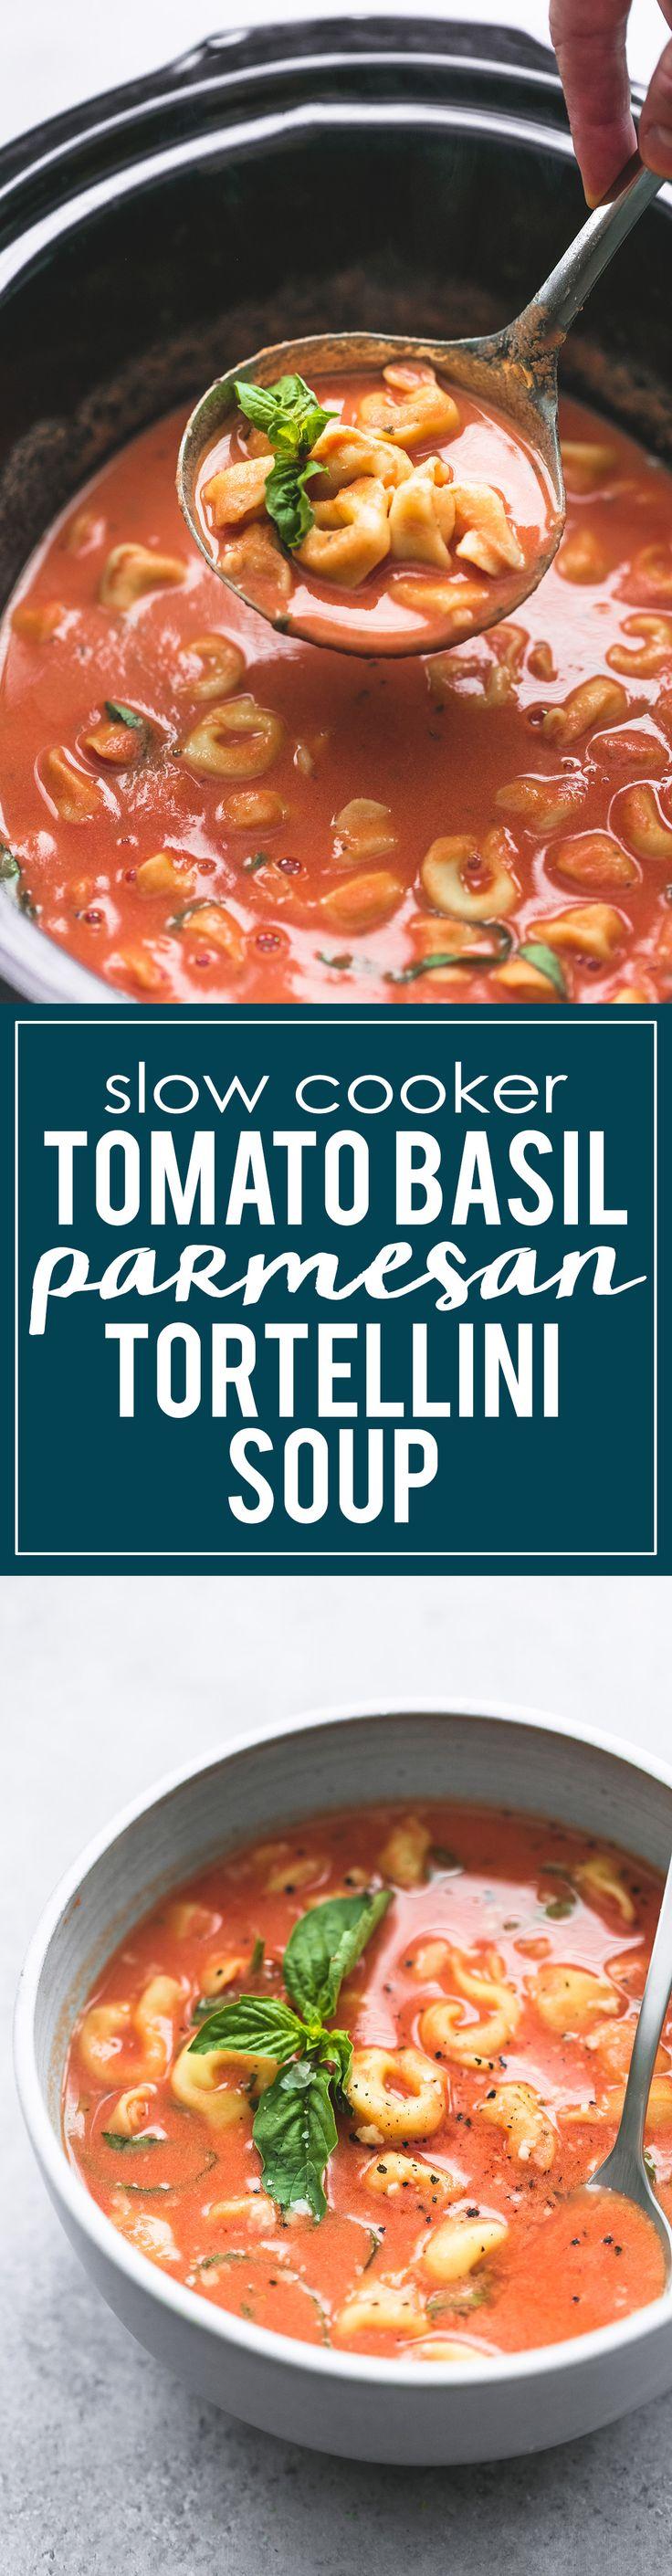 Slow Cooker Tomato Basil Parmesan Soup | lecremedelacrumb.com